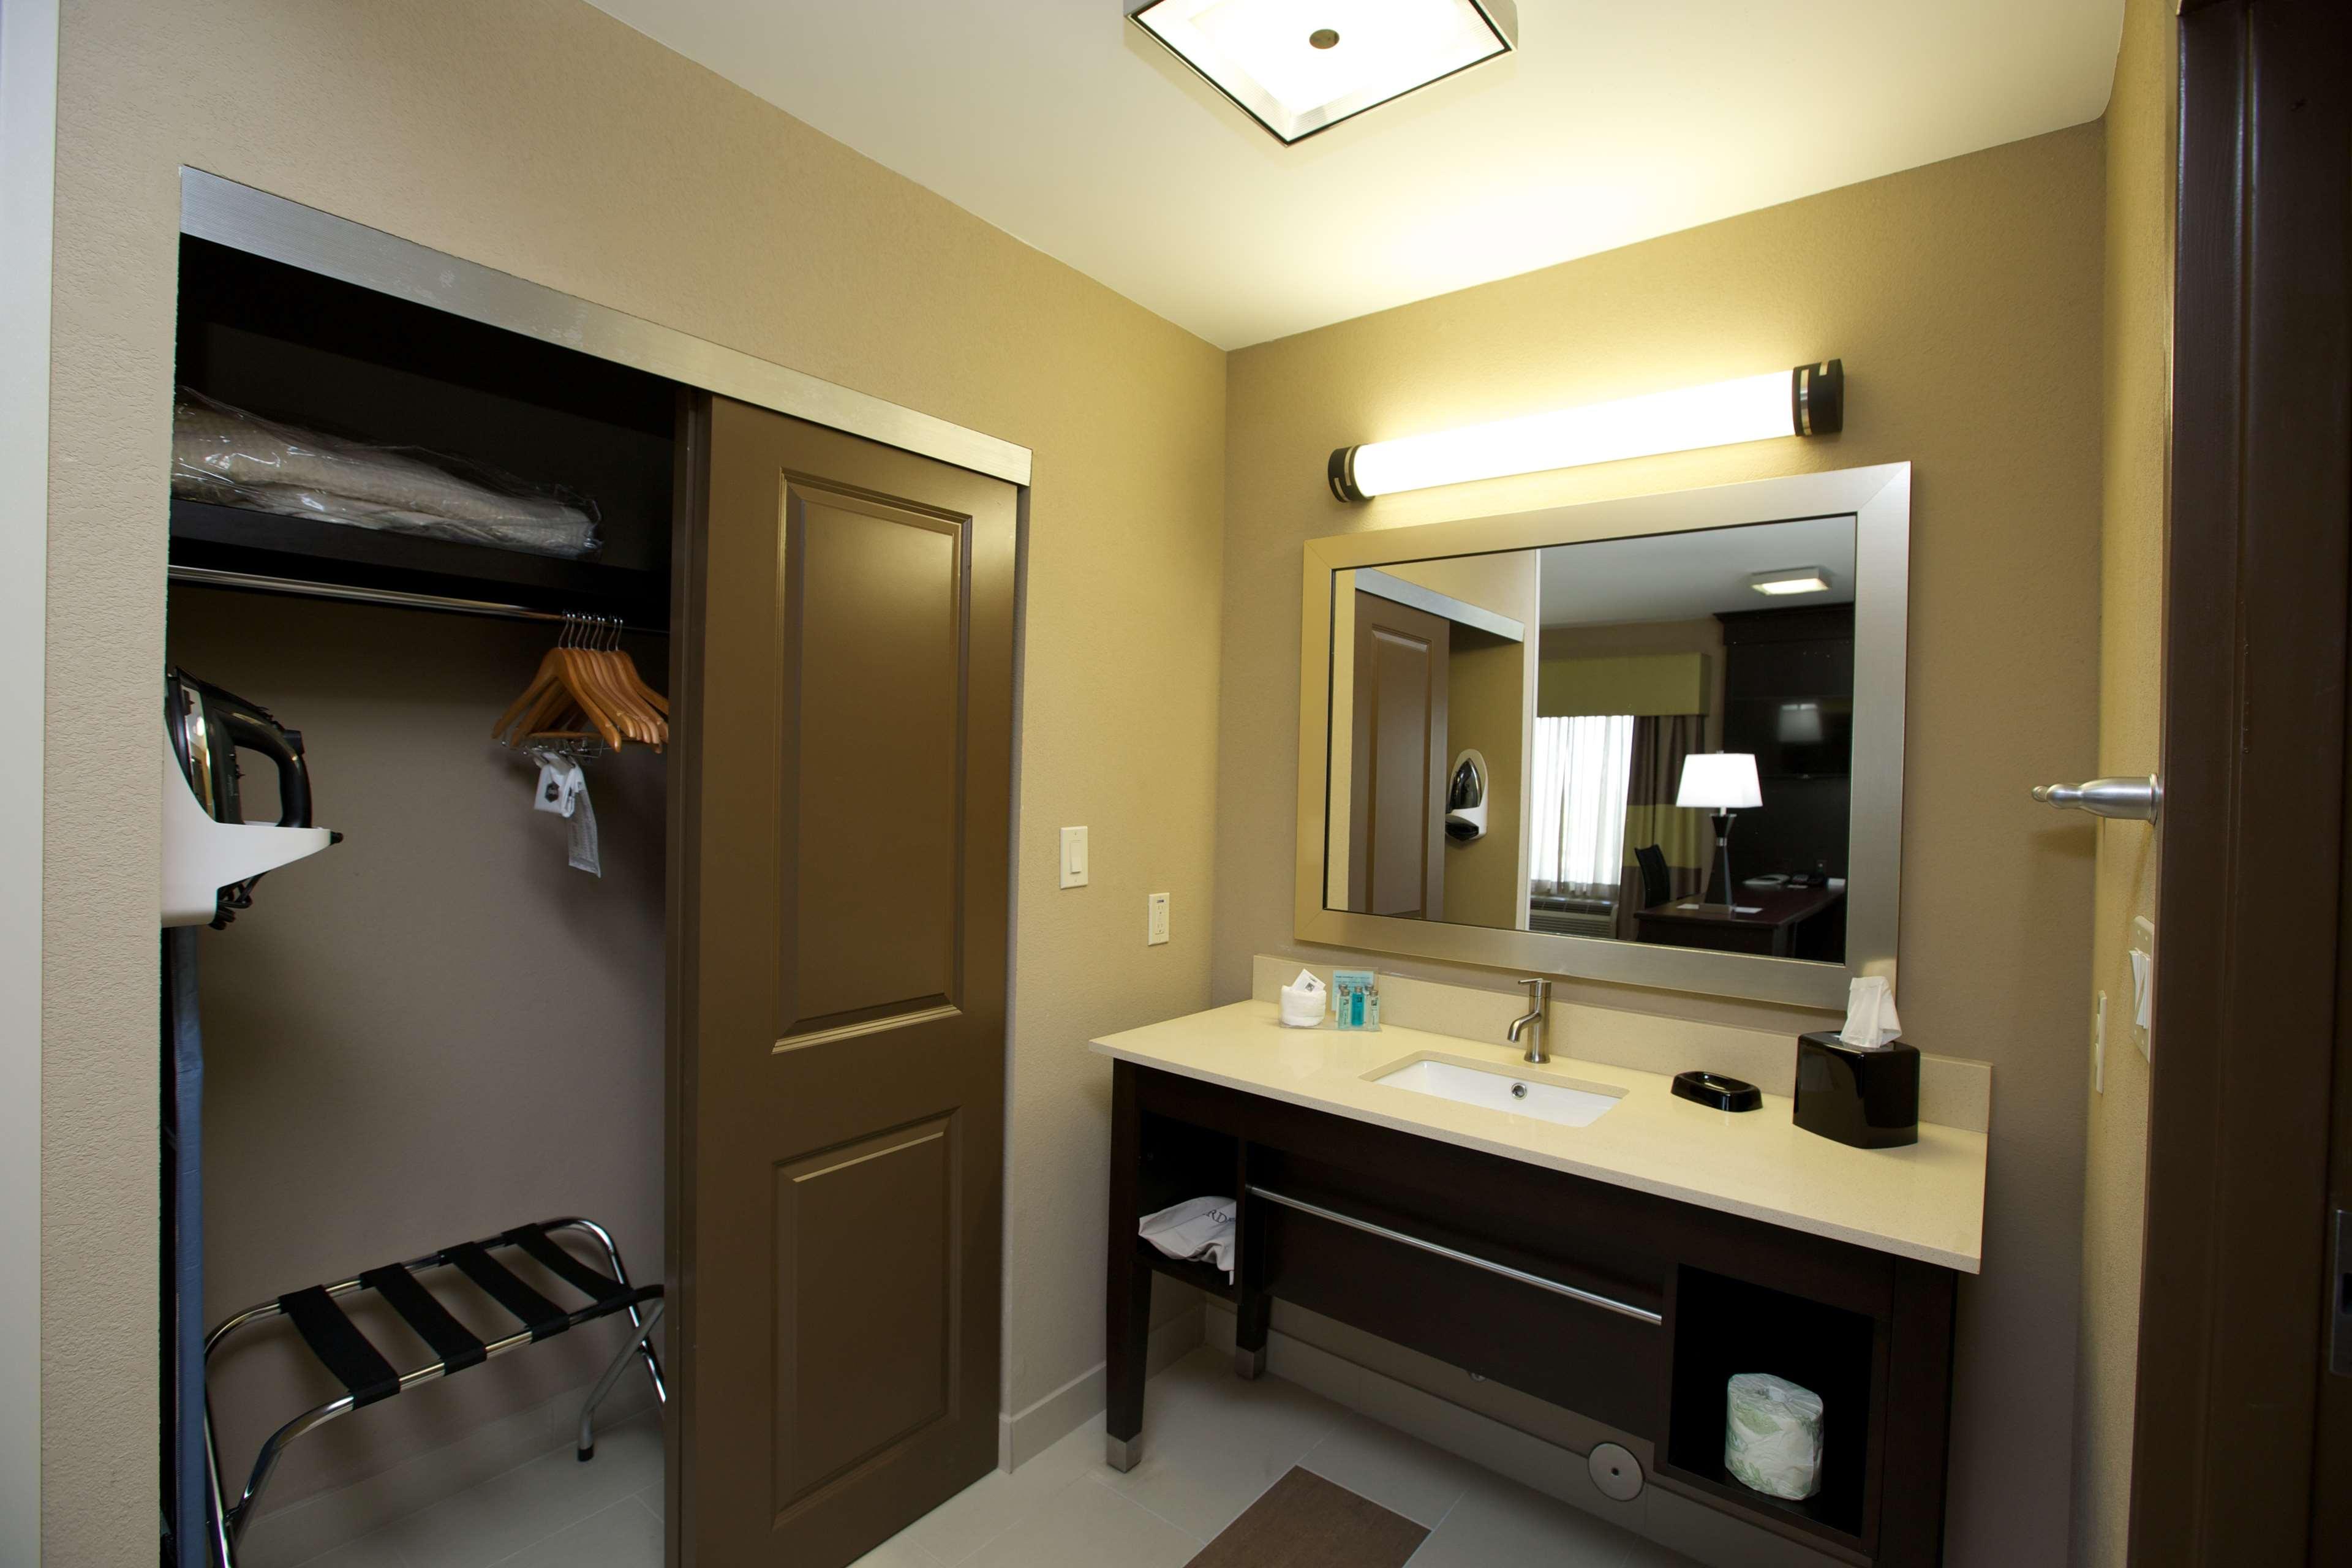 Hampton Inn & Suites Missouri City, TX image 27